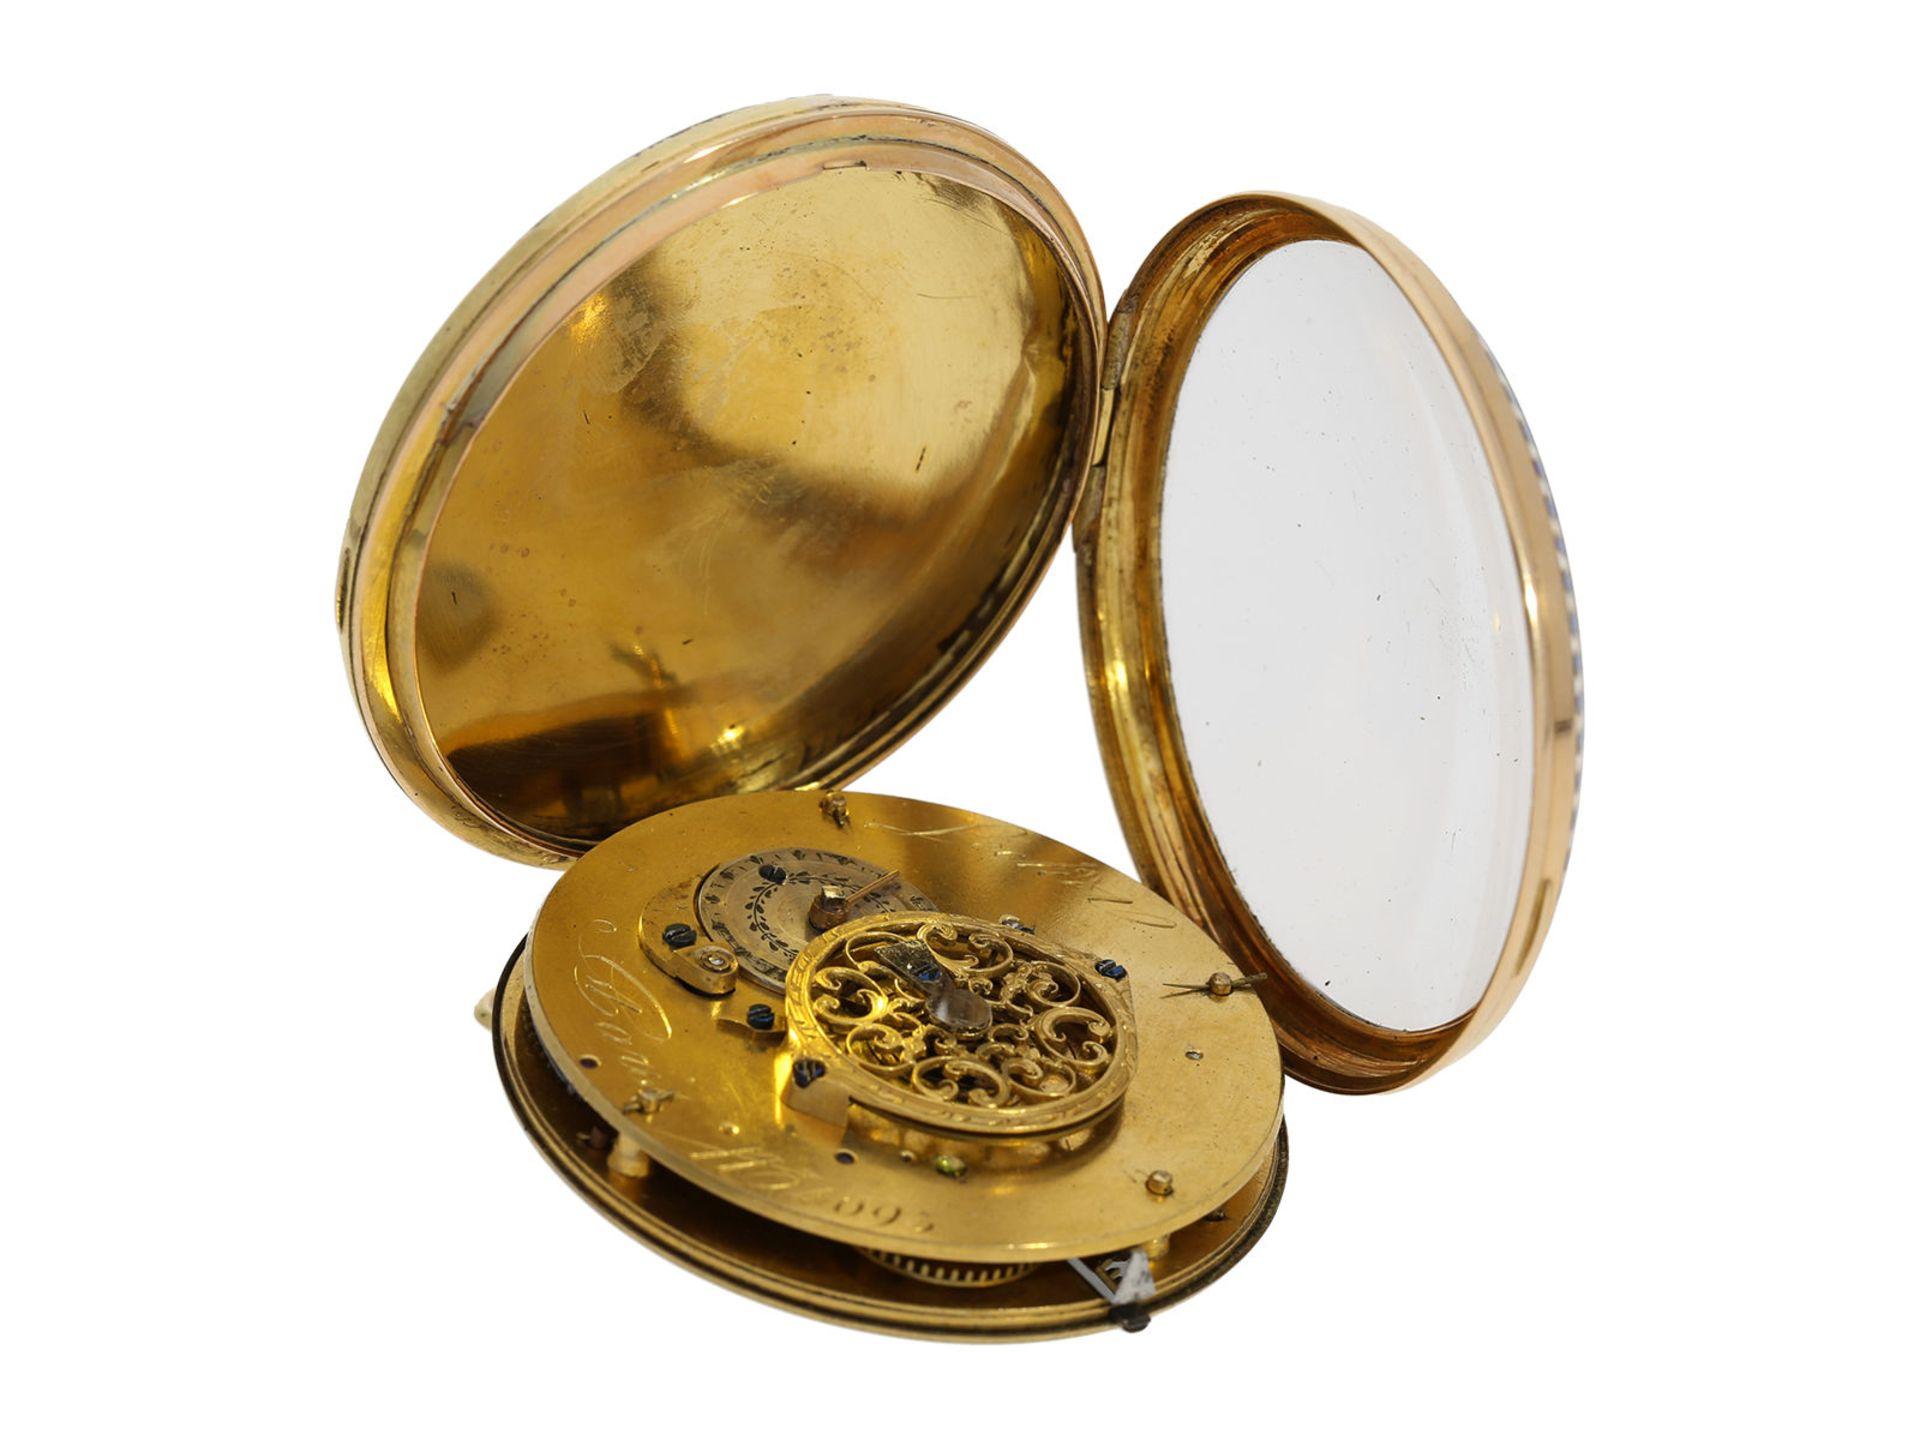 Pocket watch: large gold/ enamel pocket watch, Lechet a Paris, ca. 1795 - Bild 4 aus 4